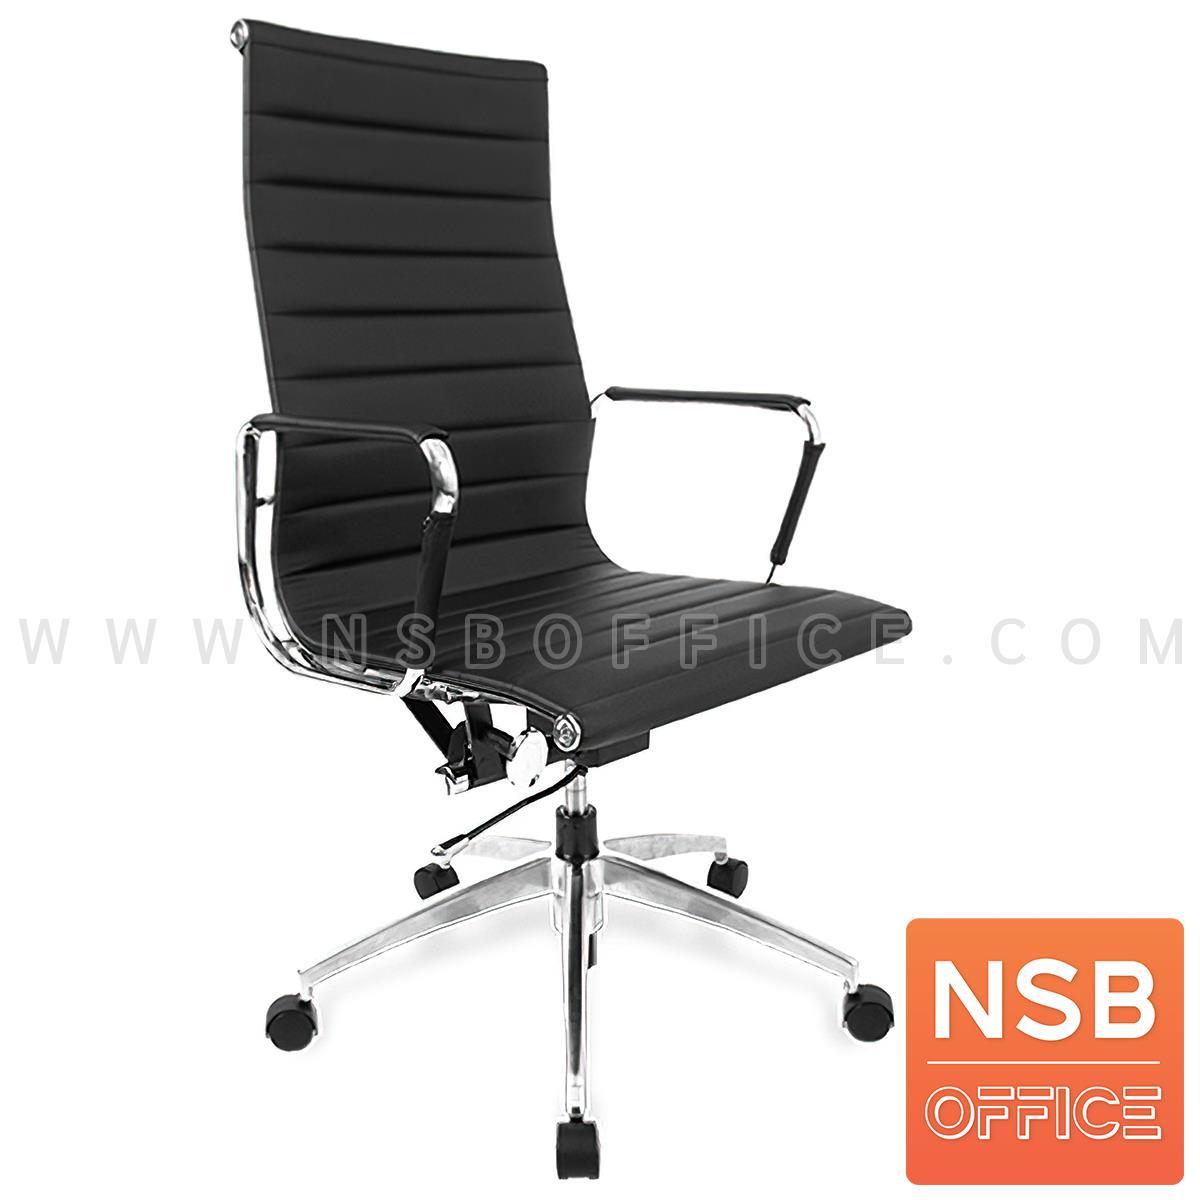 B26A110:เก้าอี้สำนักงานหลังบาง รุ่น PM-A7  โช๊คแก๊ส มีก้อนโยก ขาเหล็กชุบโครเมี่ยม